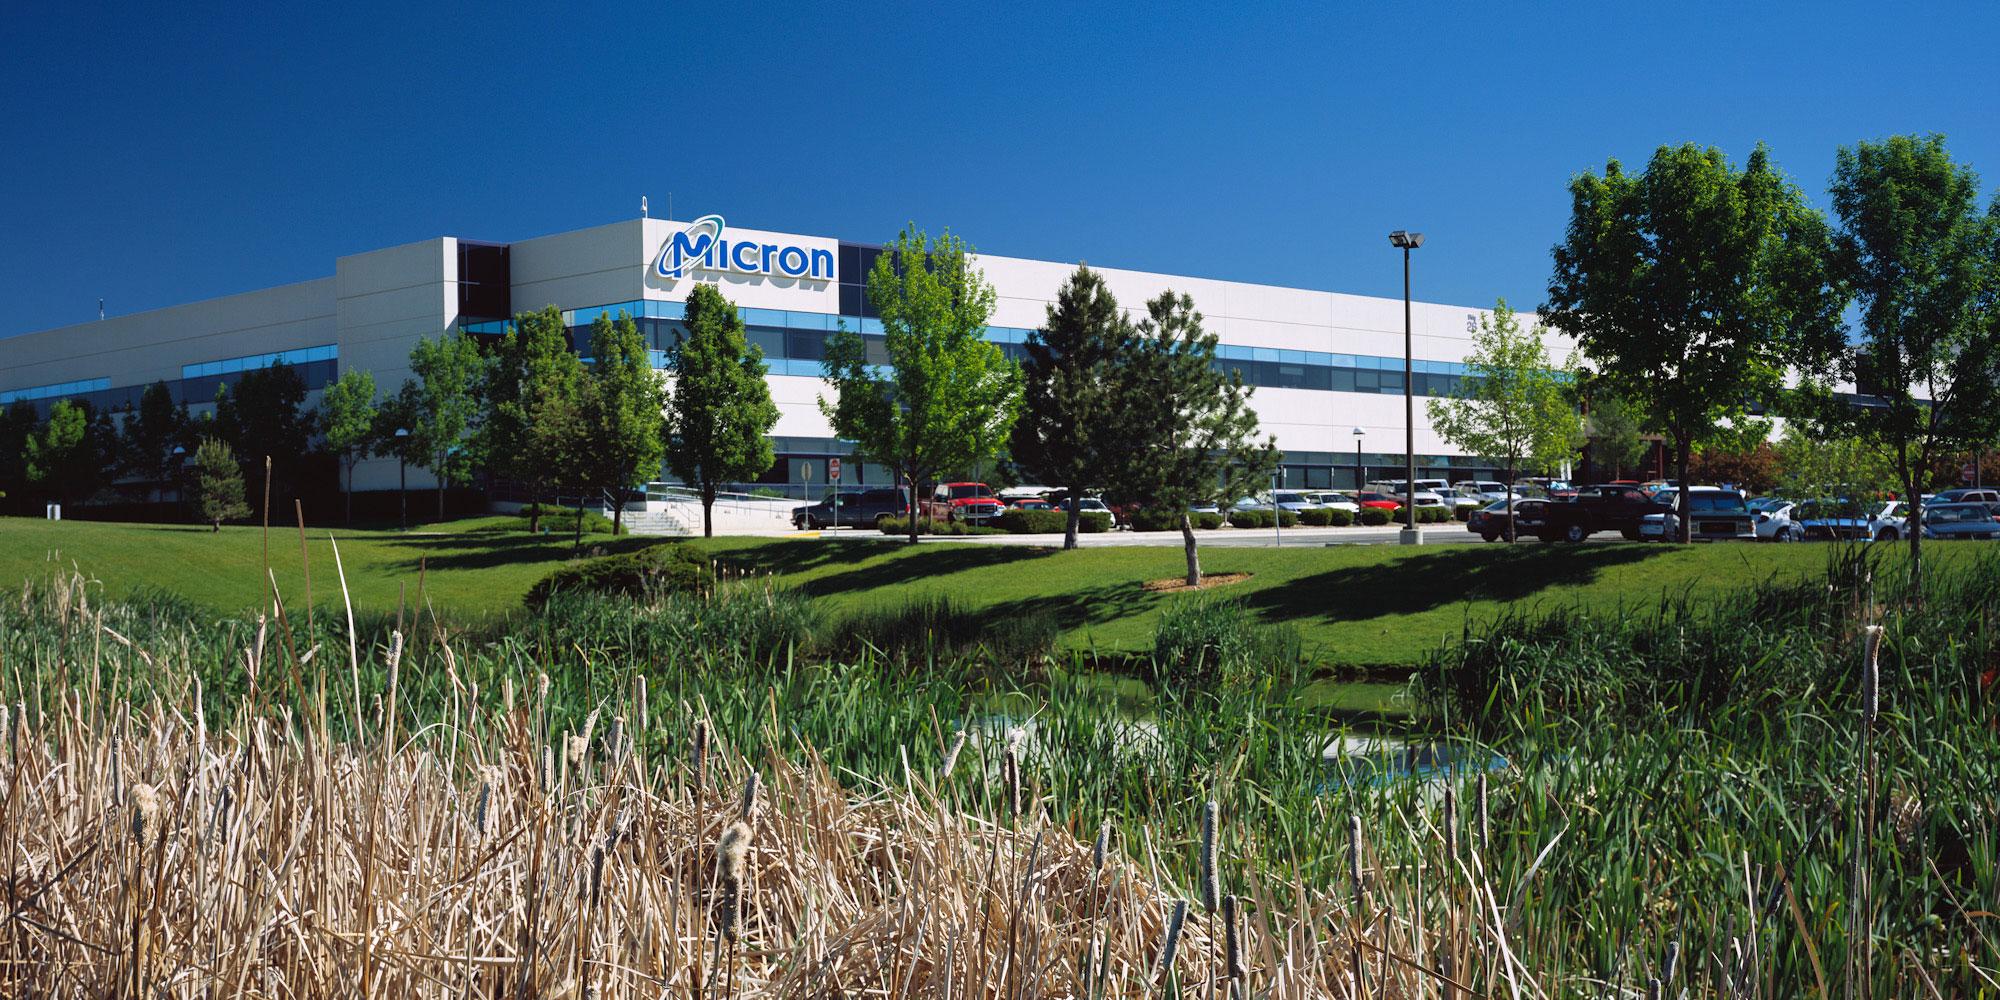 A Micron facility in Boise, Idaho